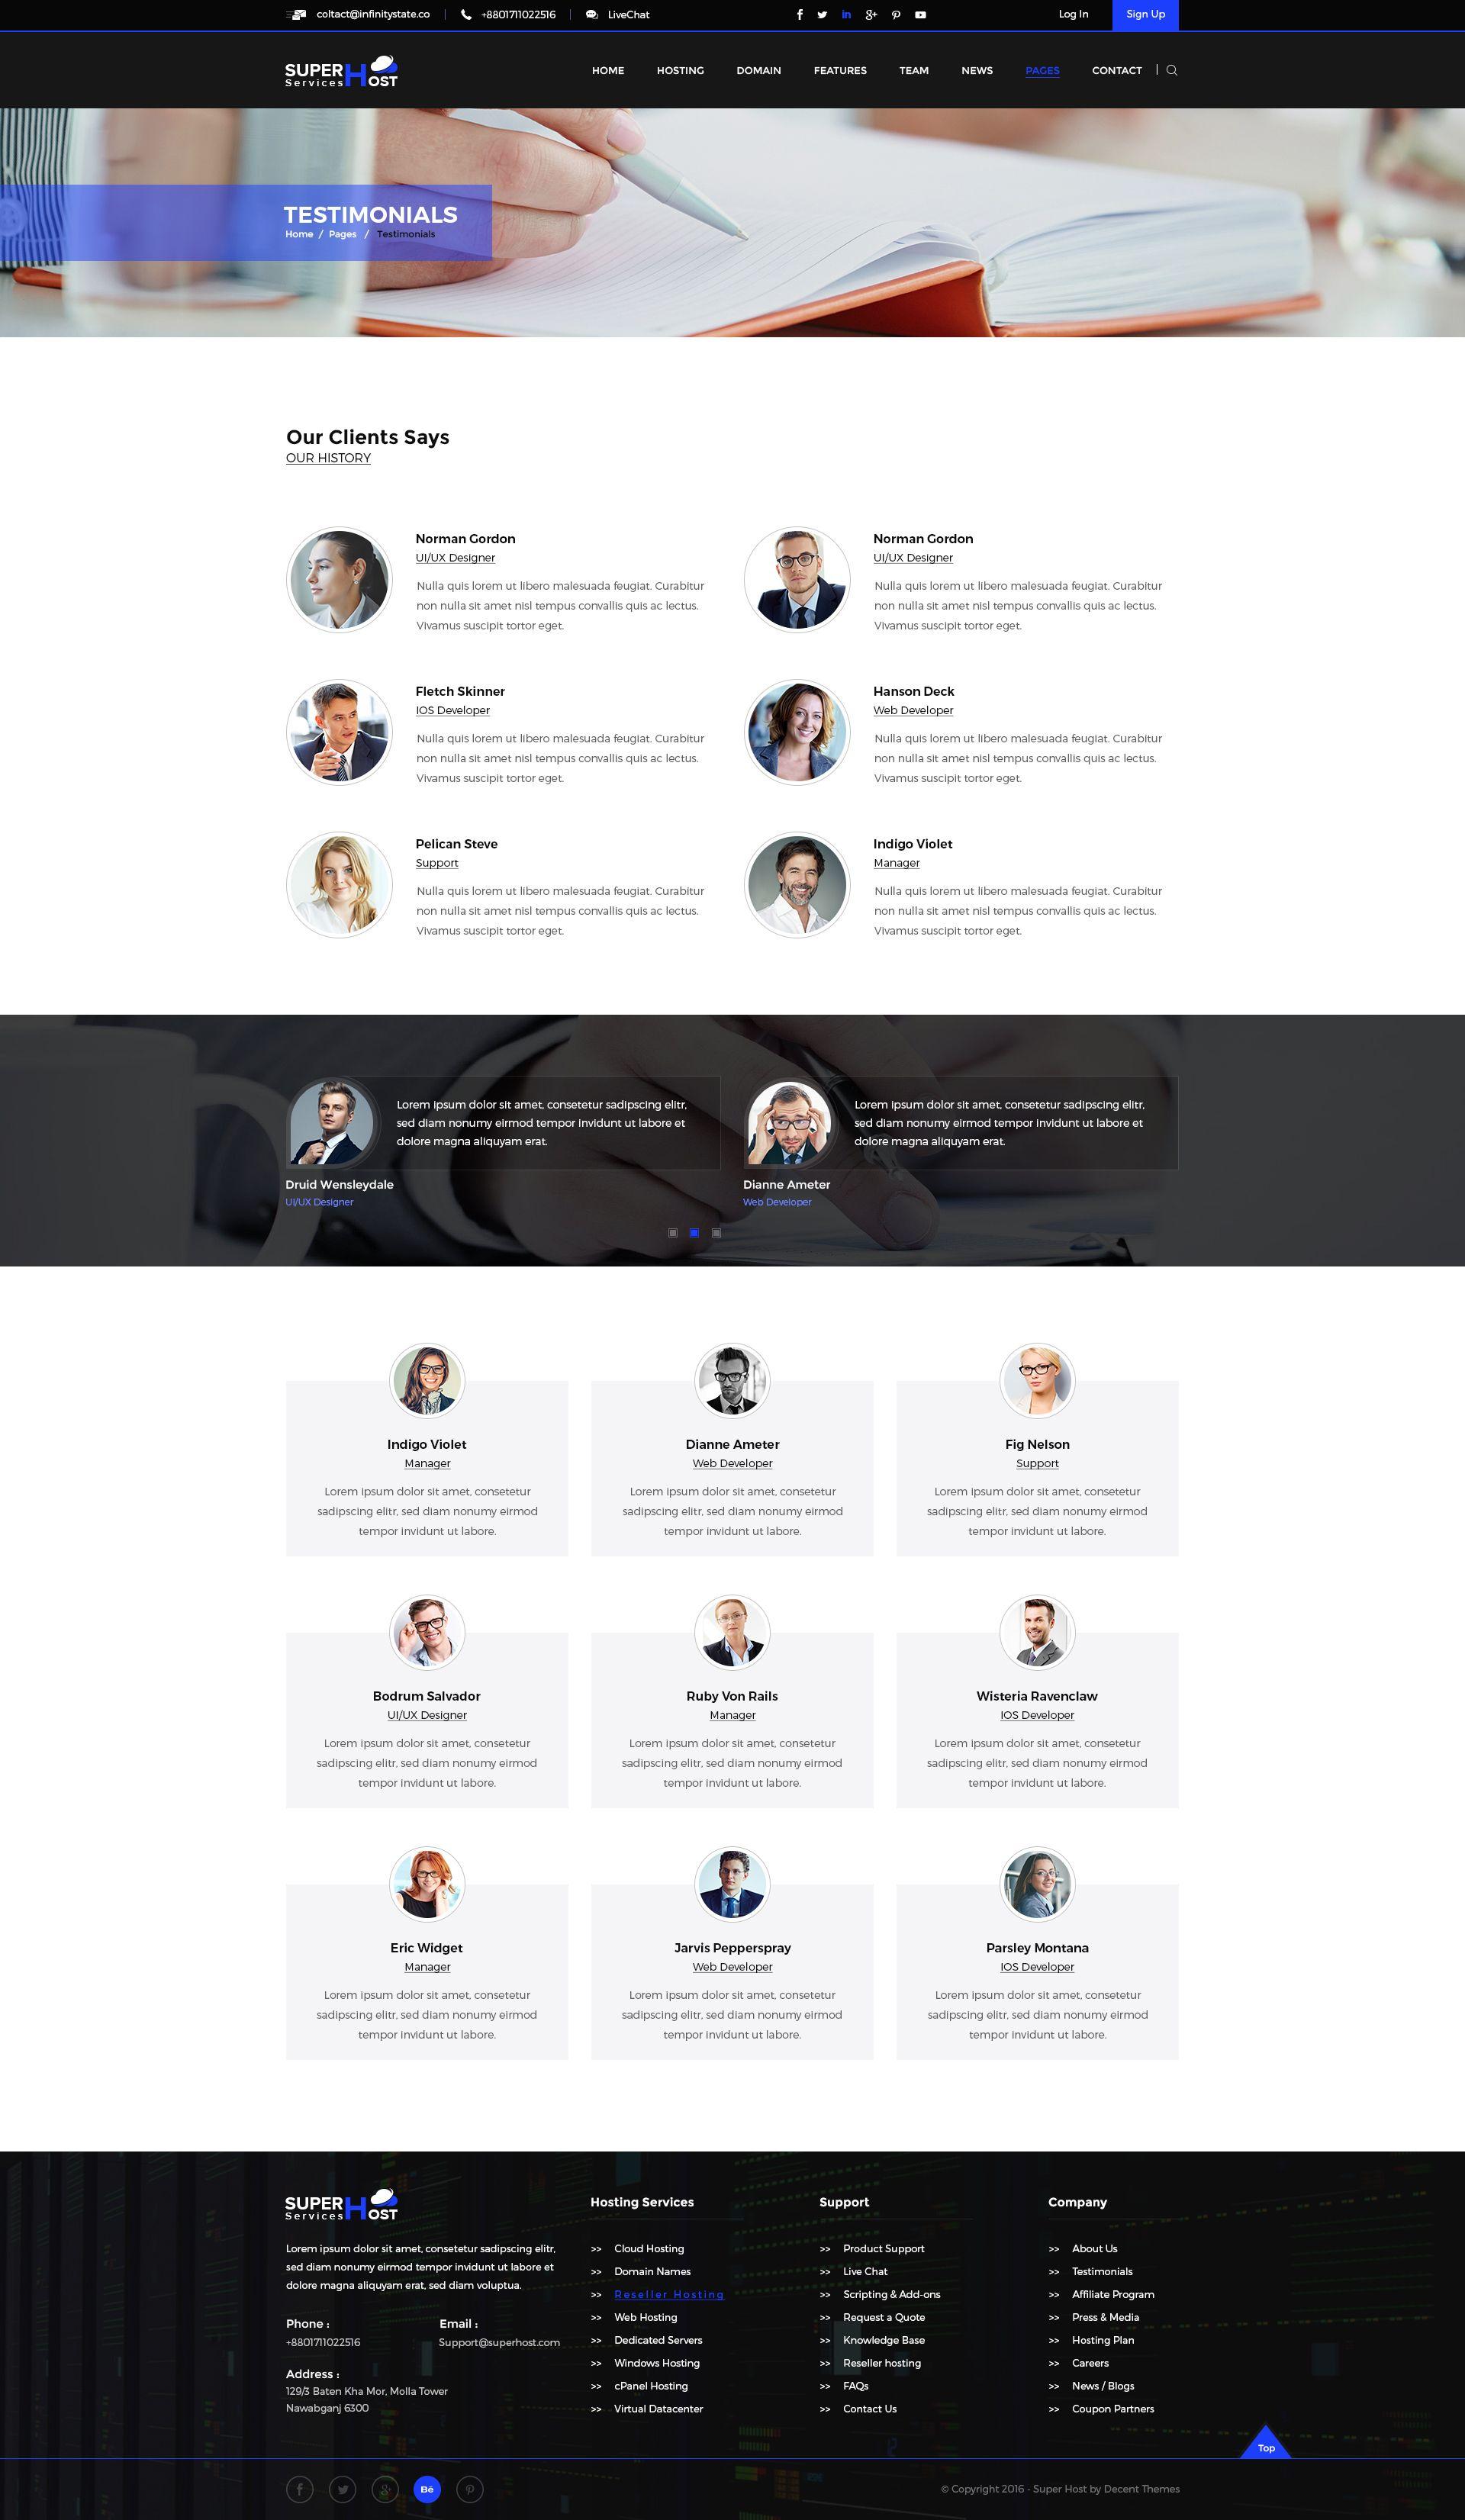 Super Host - Premium Web Hosting PSD Template #Premium, #Host, #Super, #Web